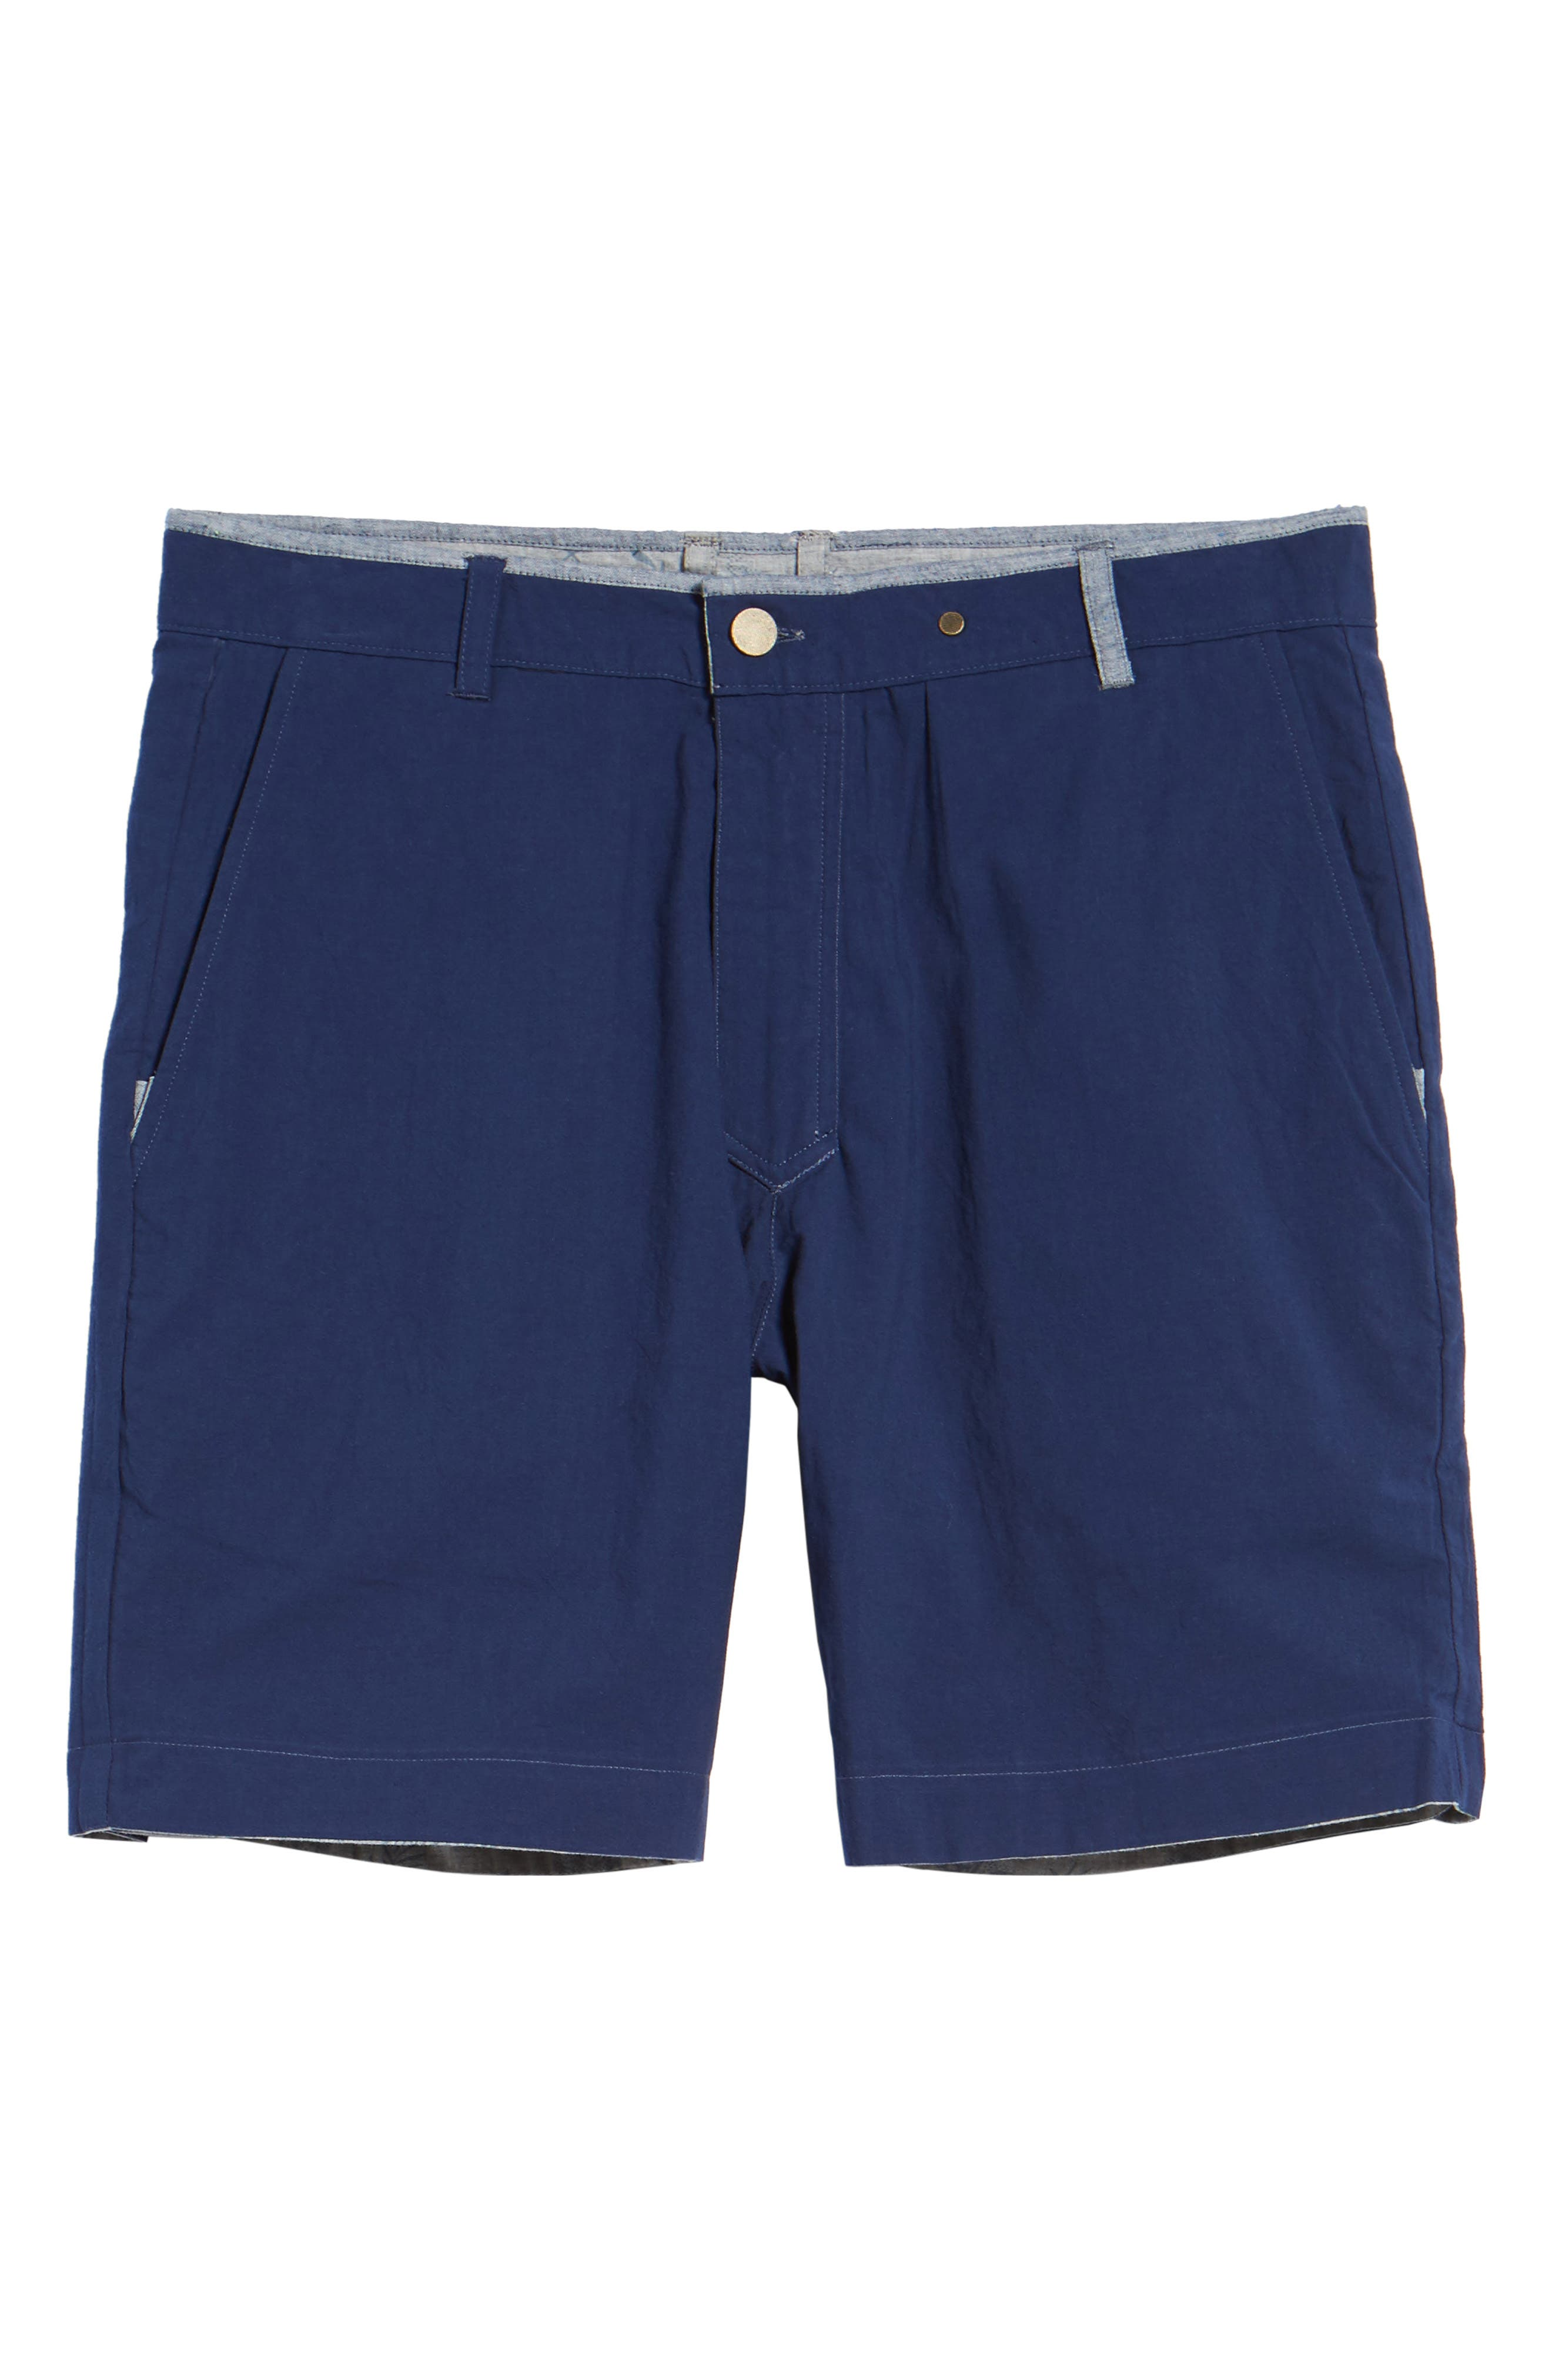 Rock Steady Reversible Shorts,                             Alternate thumbnail 6, color,